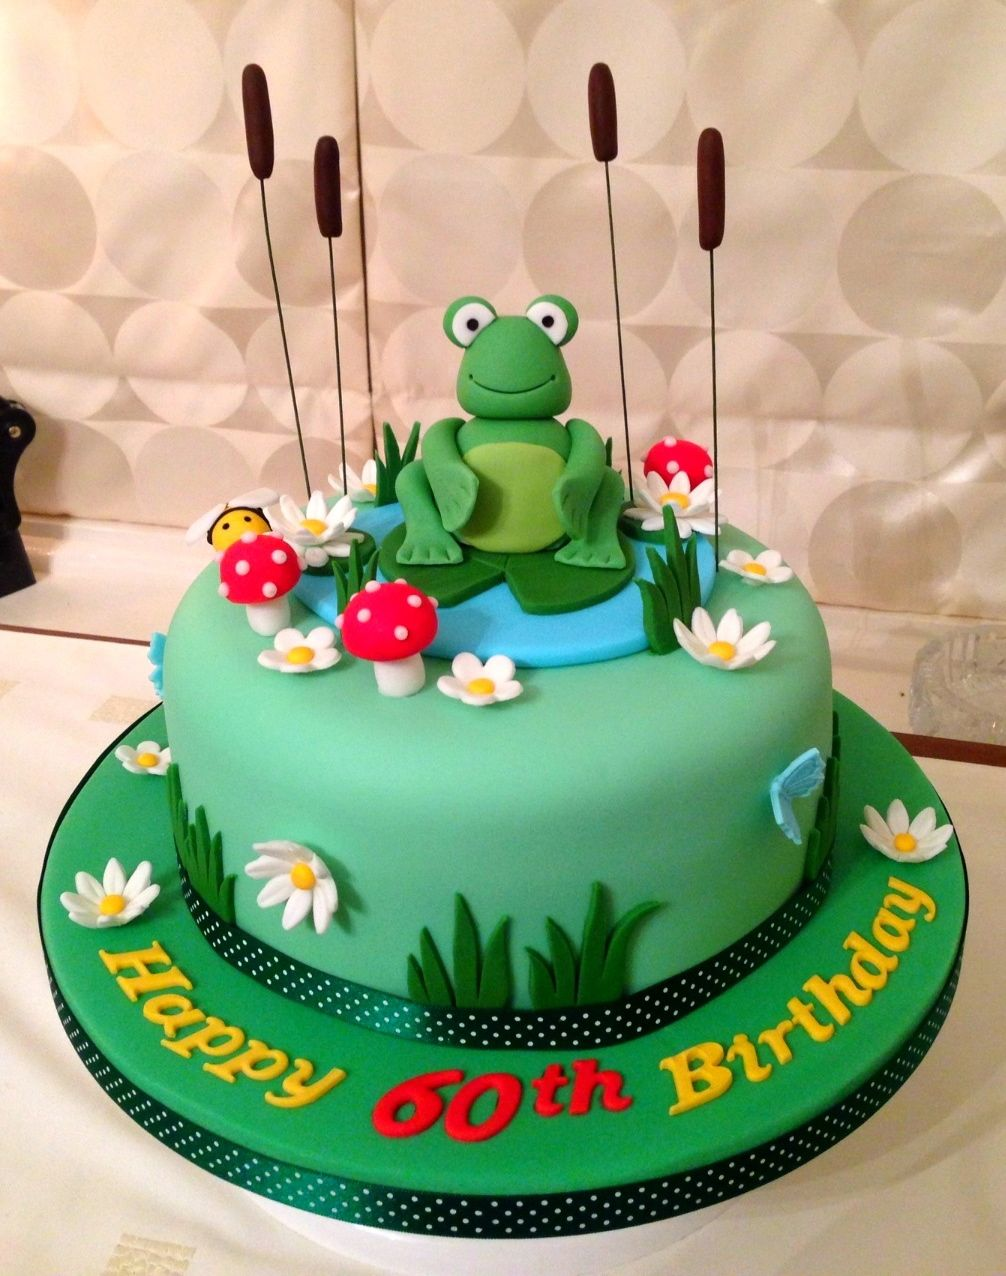 Frog Birthday Cake Favorite Recipes In 2018 Pinterest